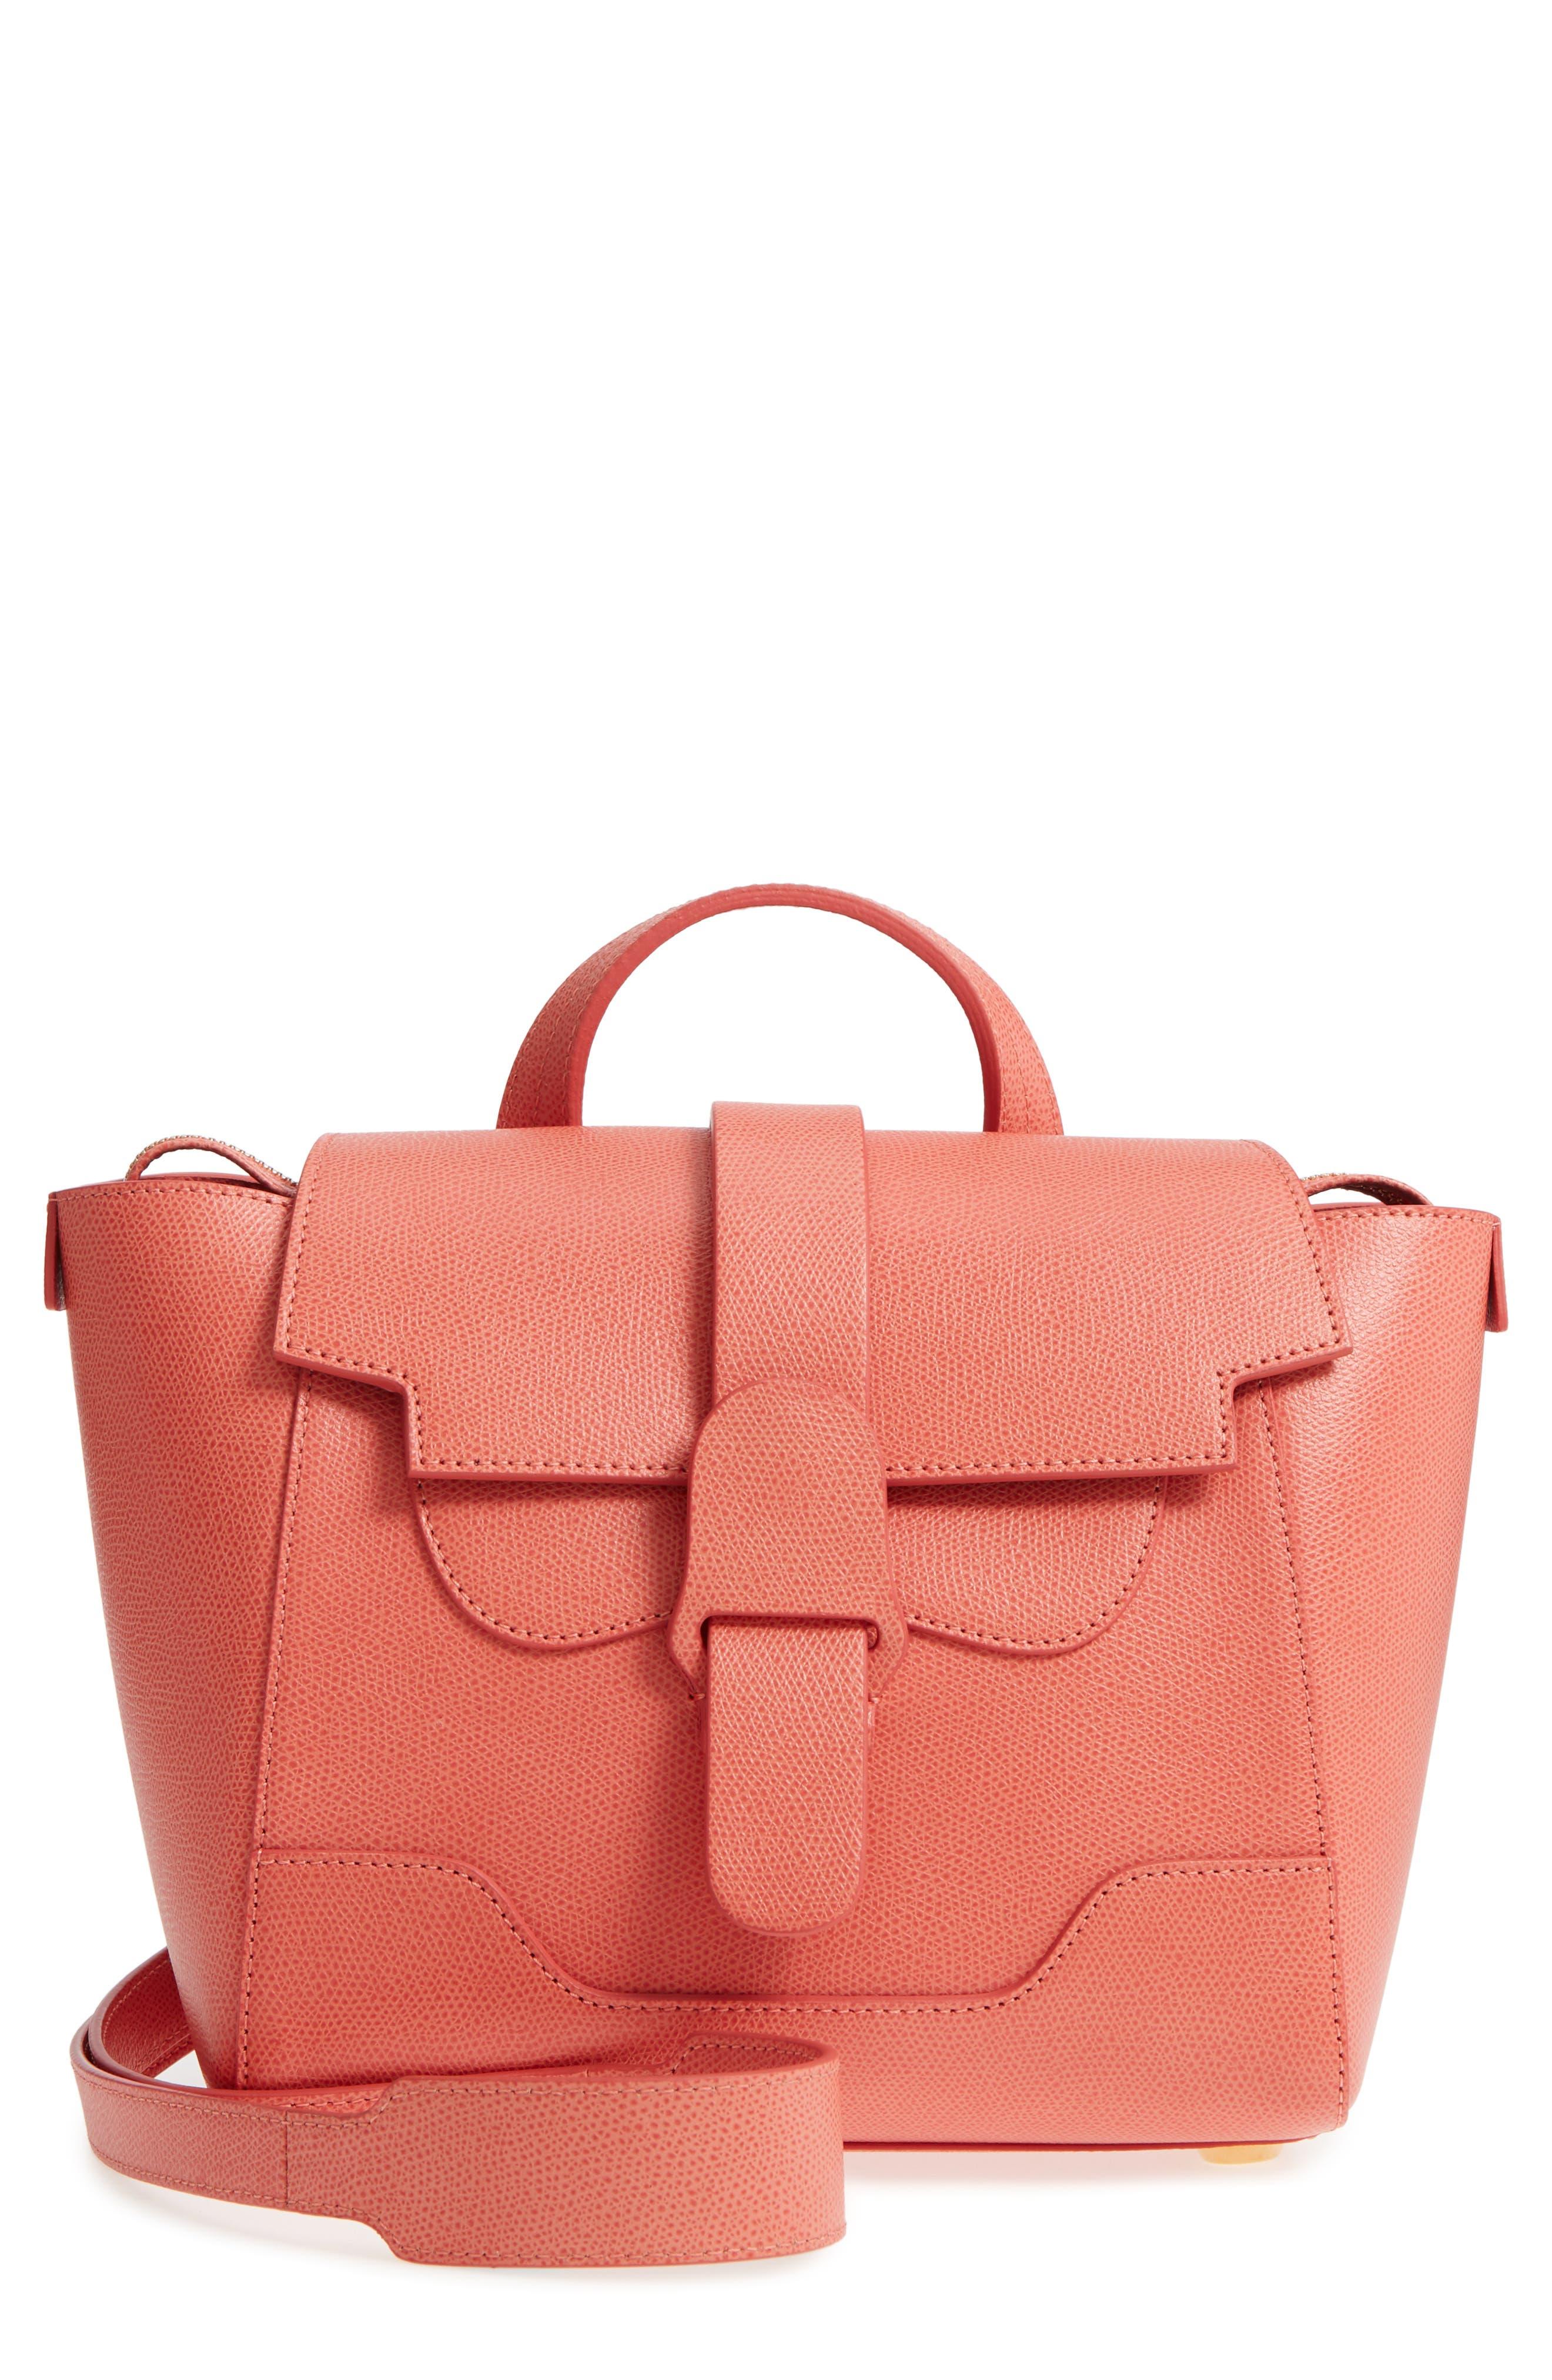 Mini Maestra Leather Satchel SENREVE $695 (Nordstrom)